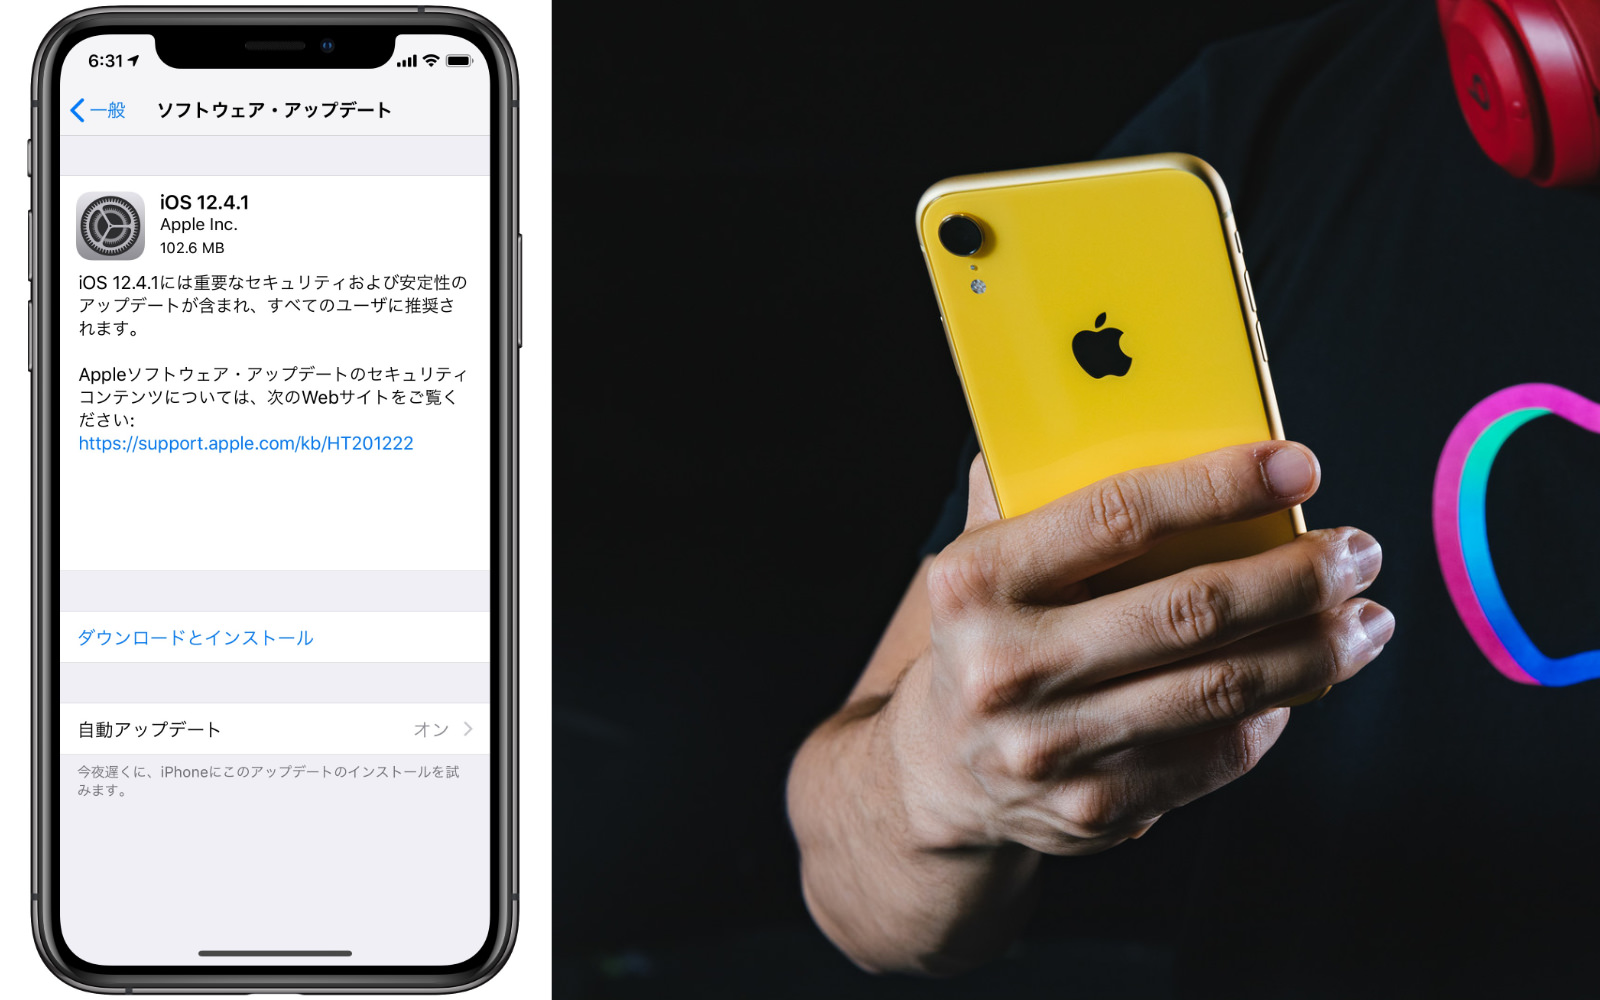 IOS12 4 1 release